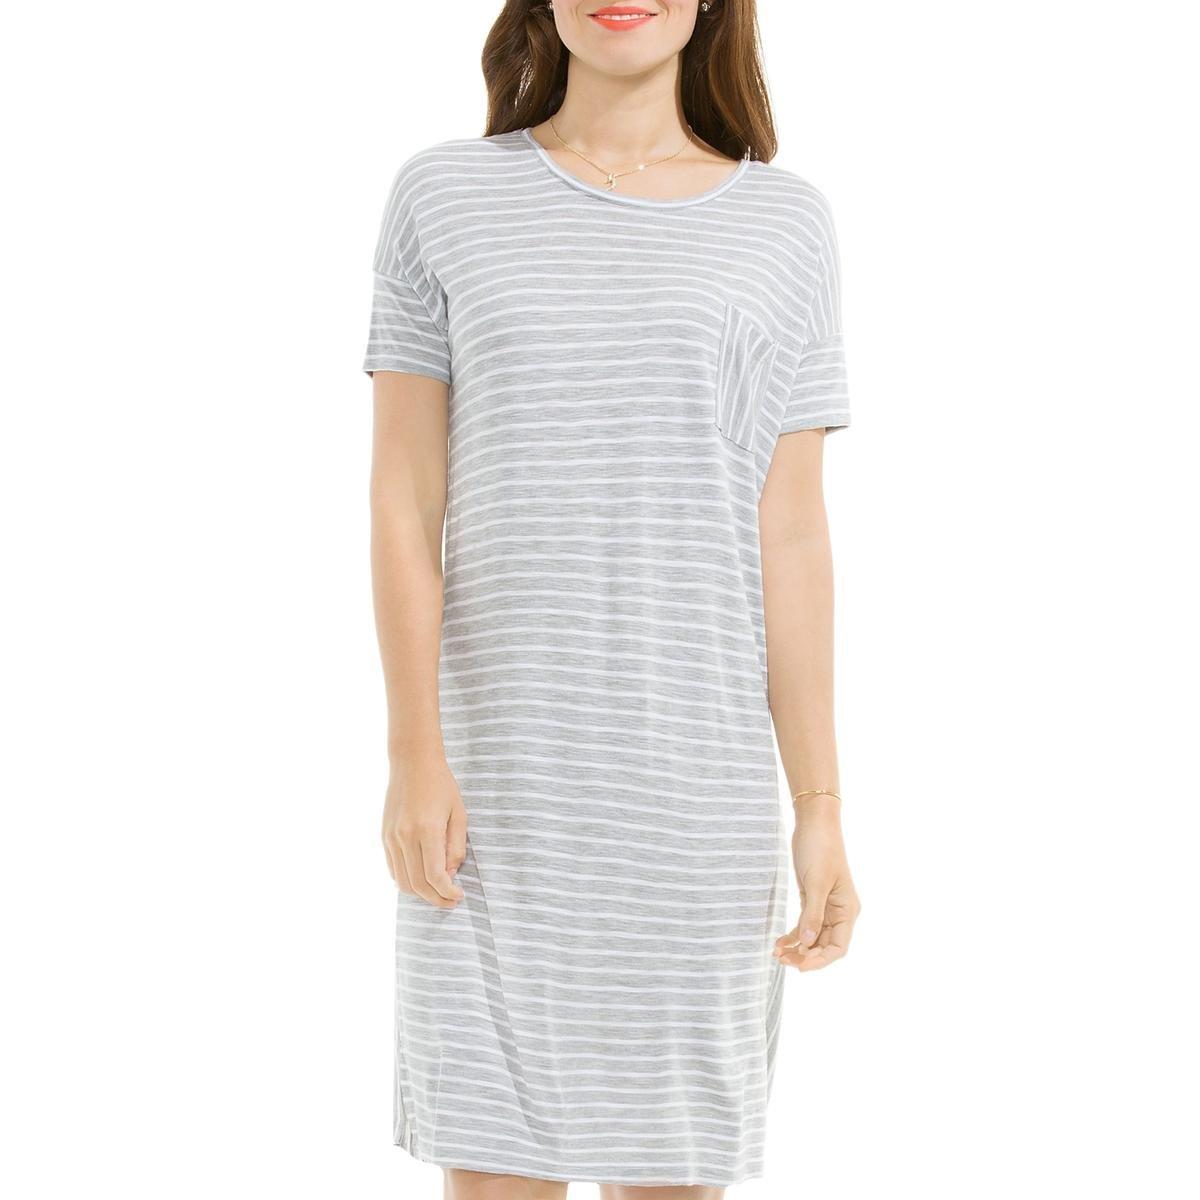 6dcd56a5b7cb Amazon.com: Two by Vince Camuto Womens Striped Short Sleeve T-Shirt Dress:  Clothing